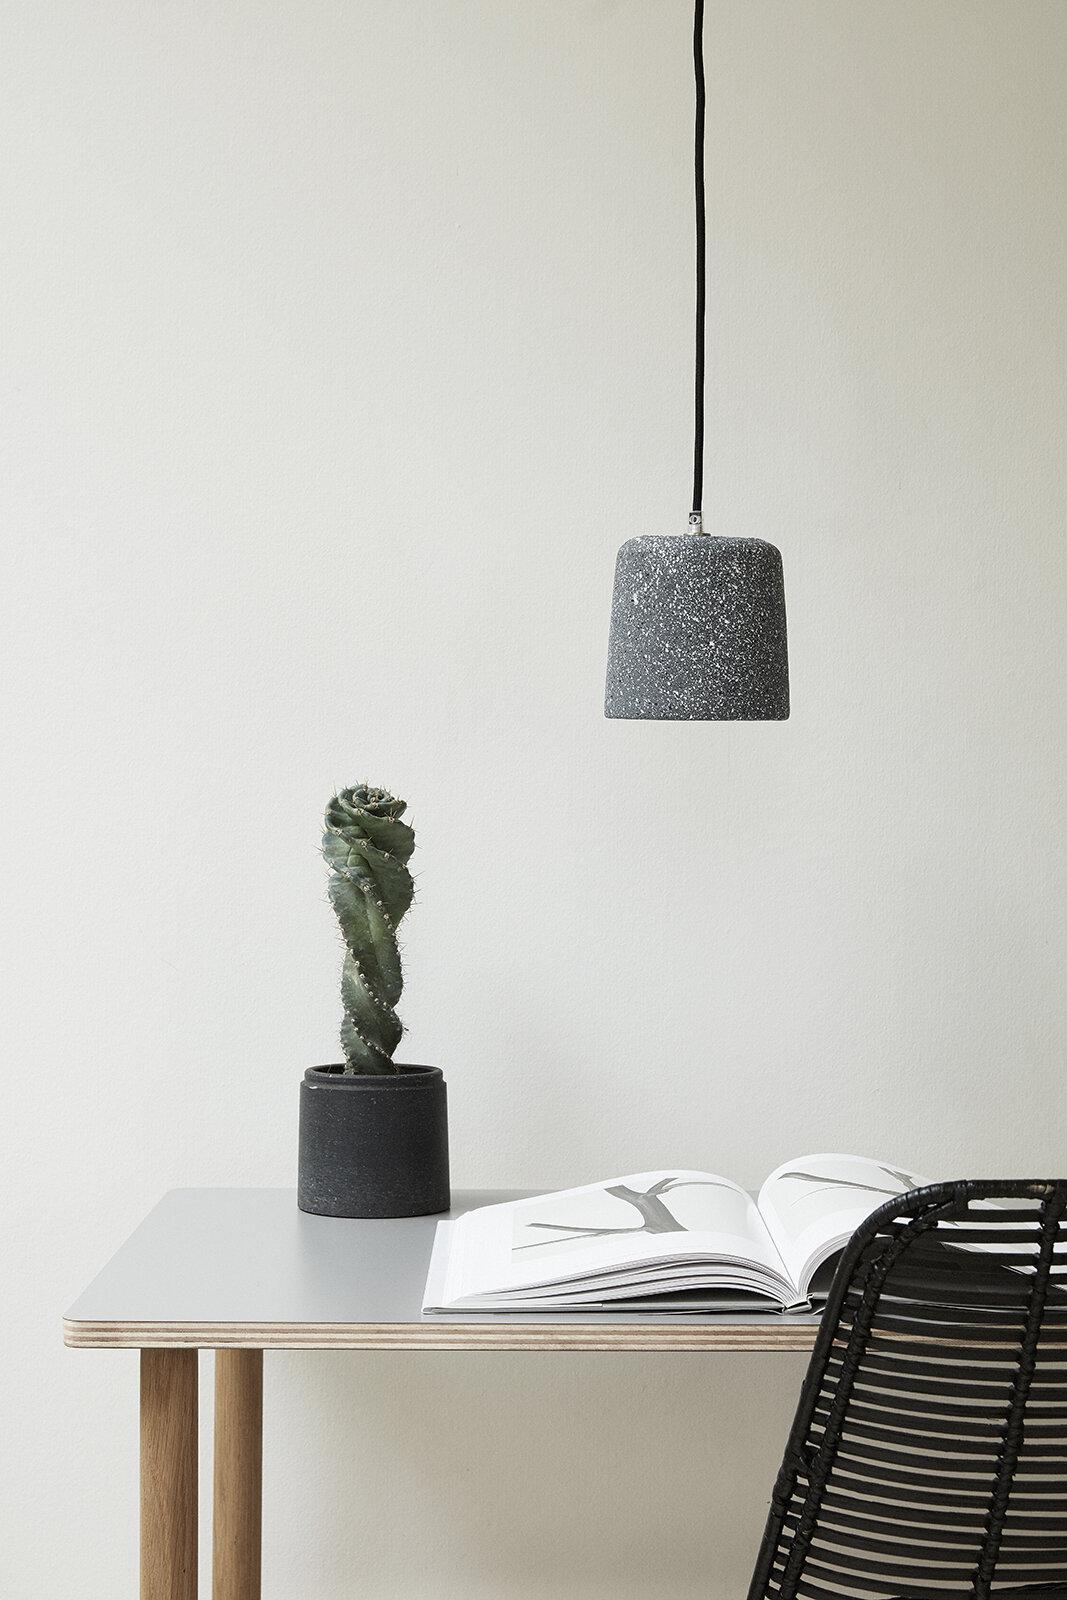 Interior Design - Create Your Dream Home